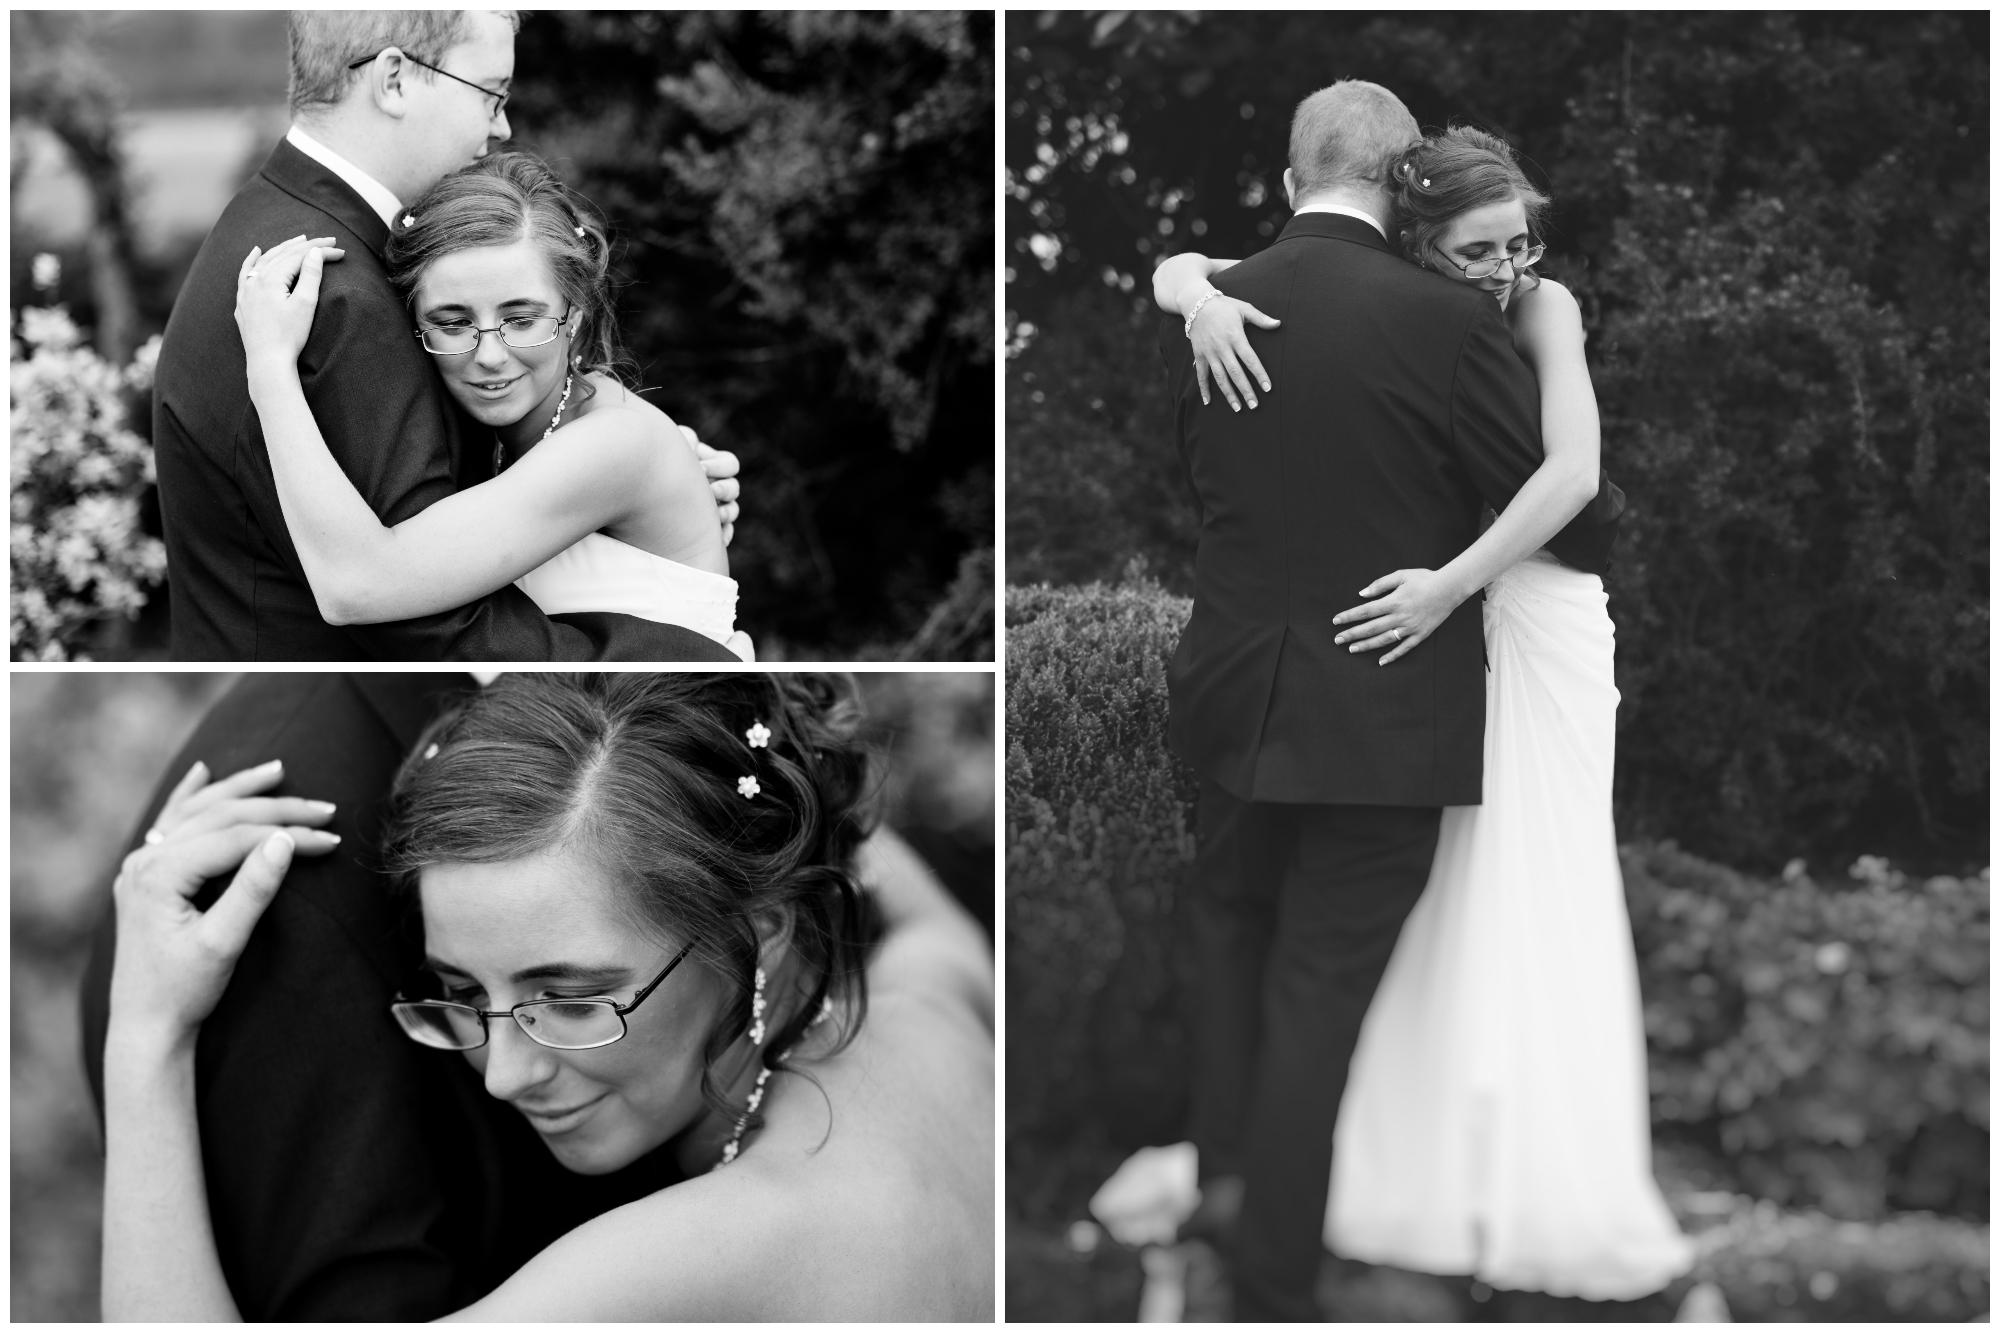 Ballymac_hotel_wedding_lisburn_groom_and_bride_portraits